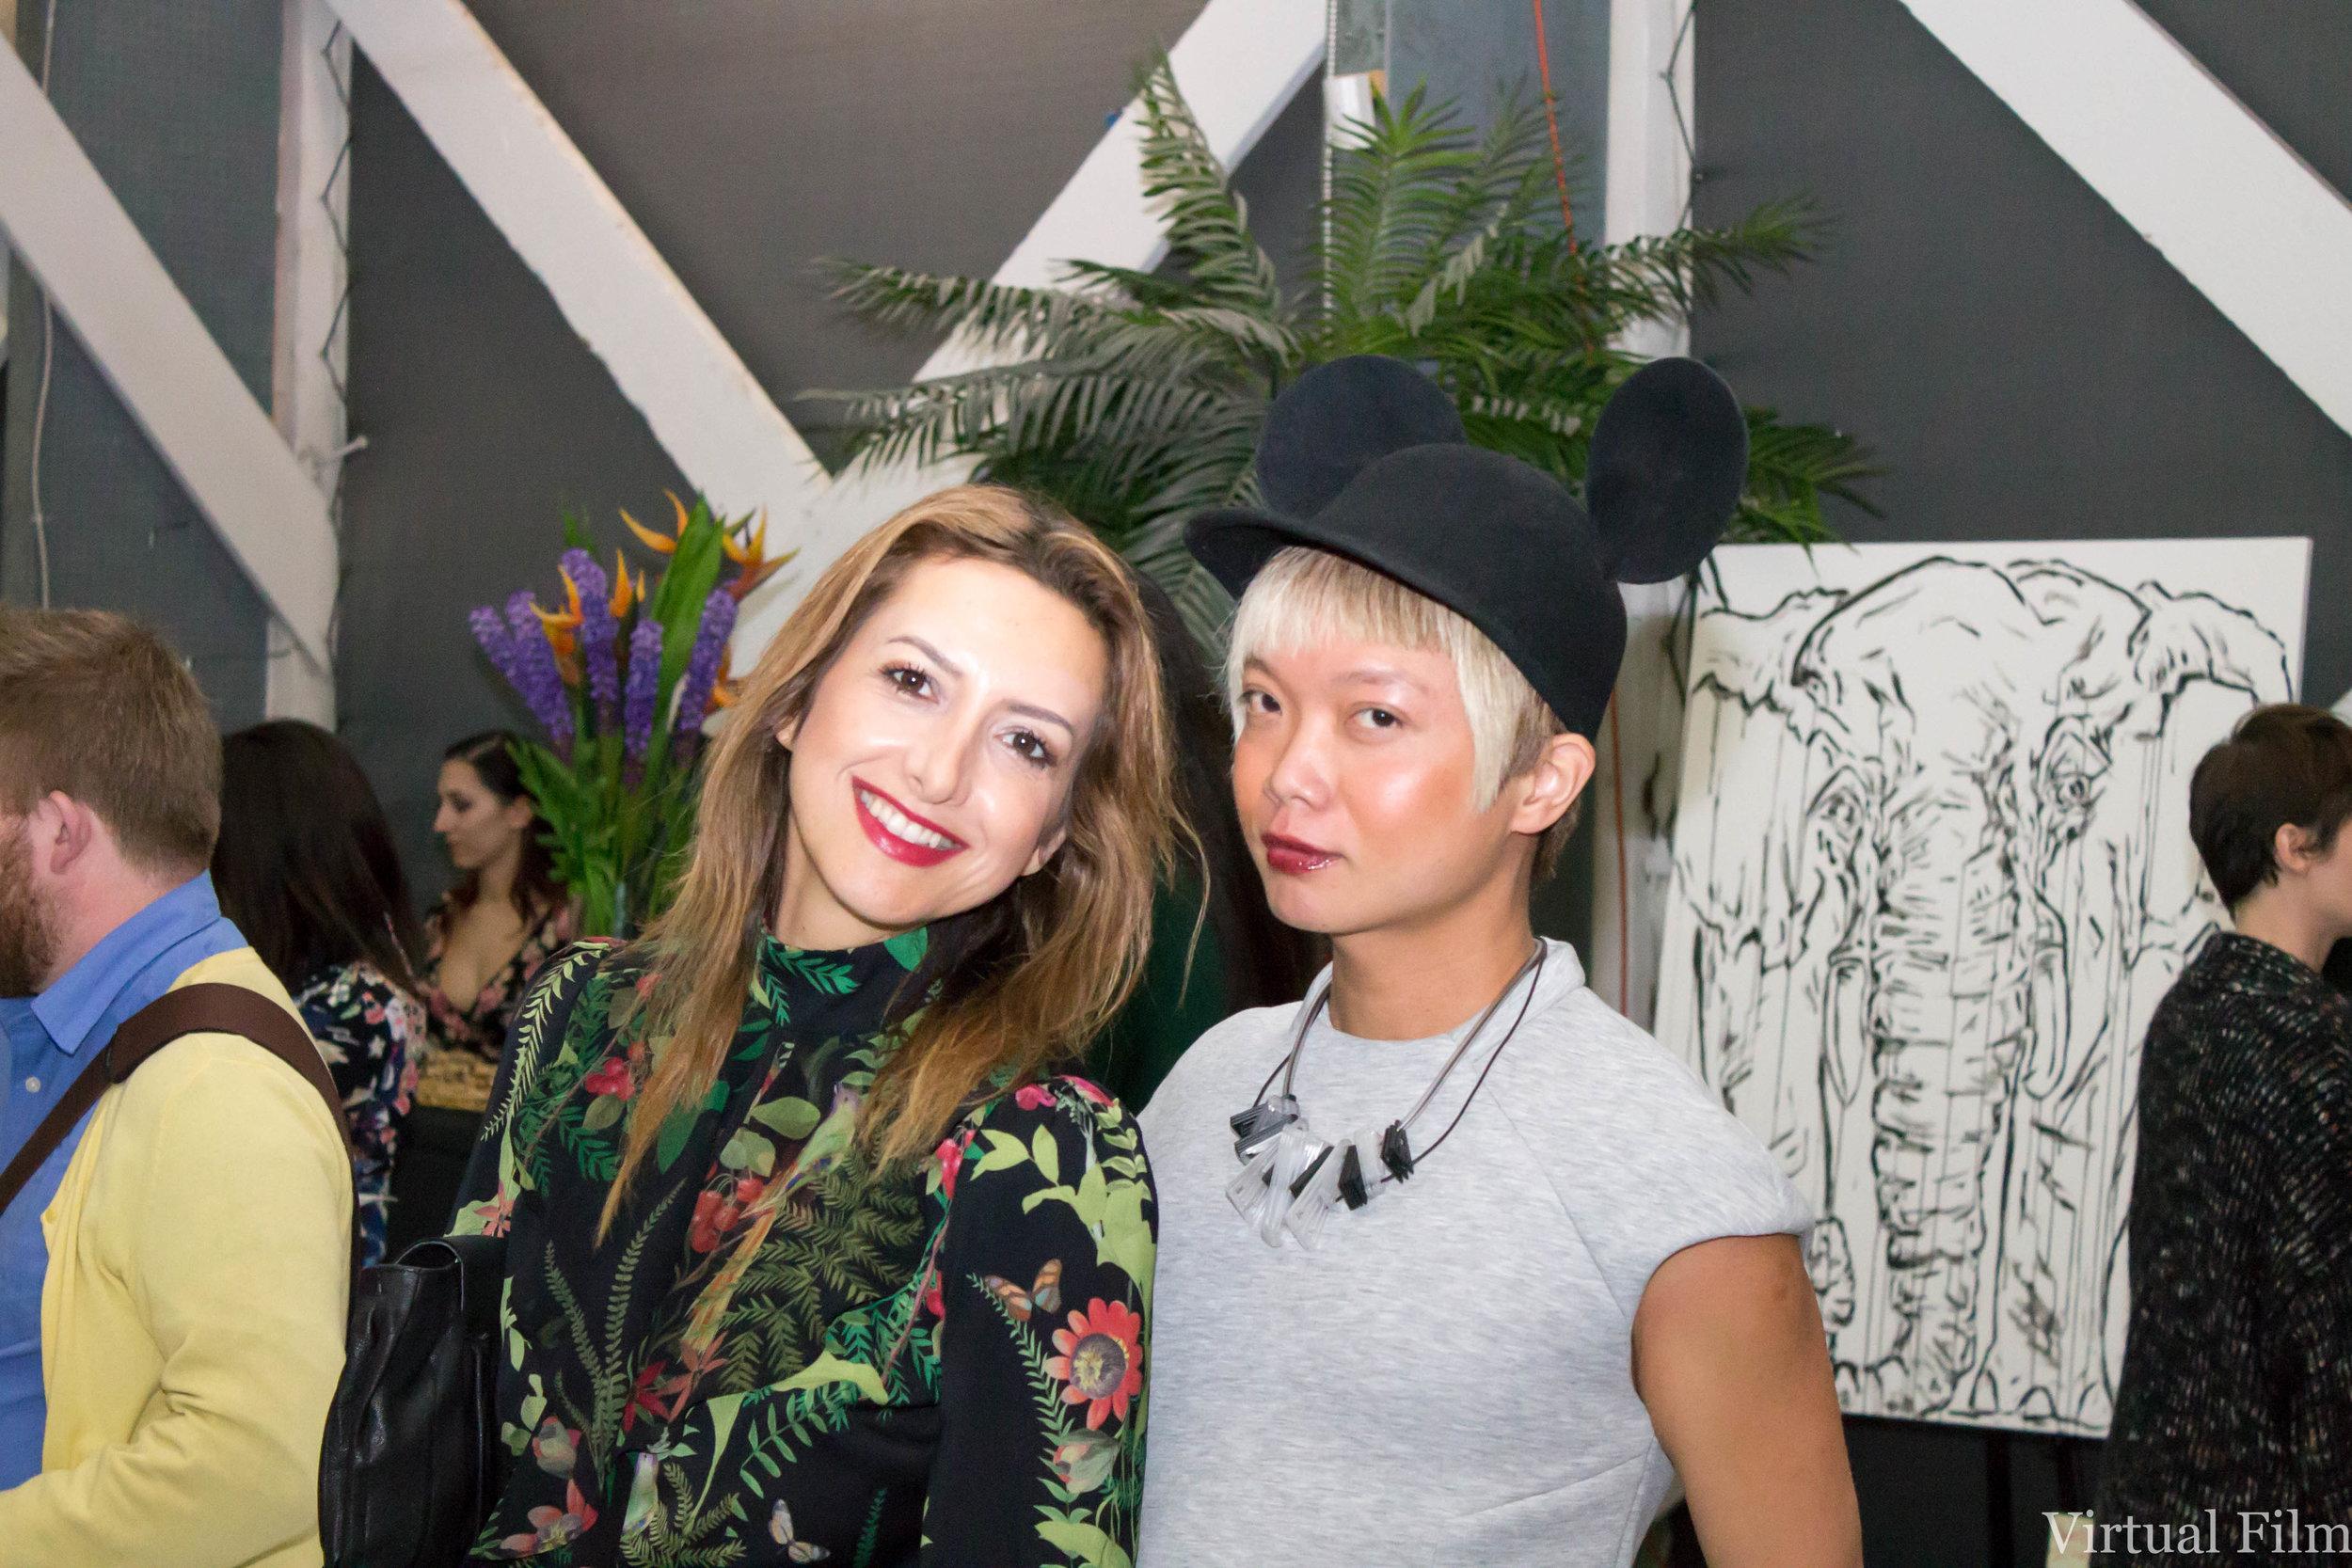 Elephantasia team reunion: Brand Director, Nazy Alvarez (Paris) & VIP Director, Victor Loo (US/Singapore)